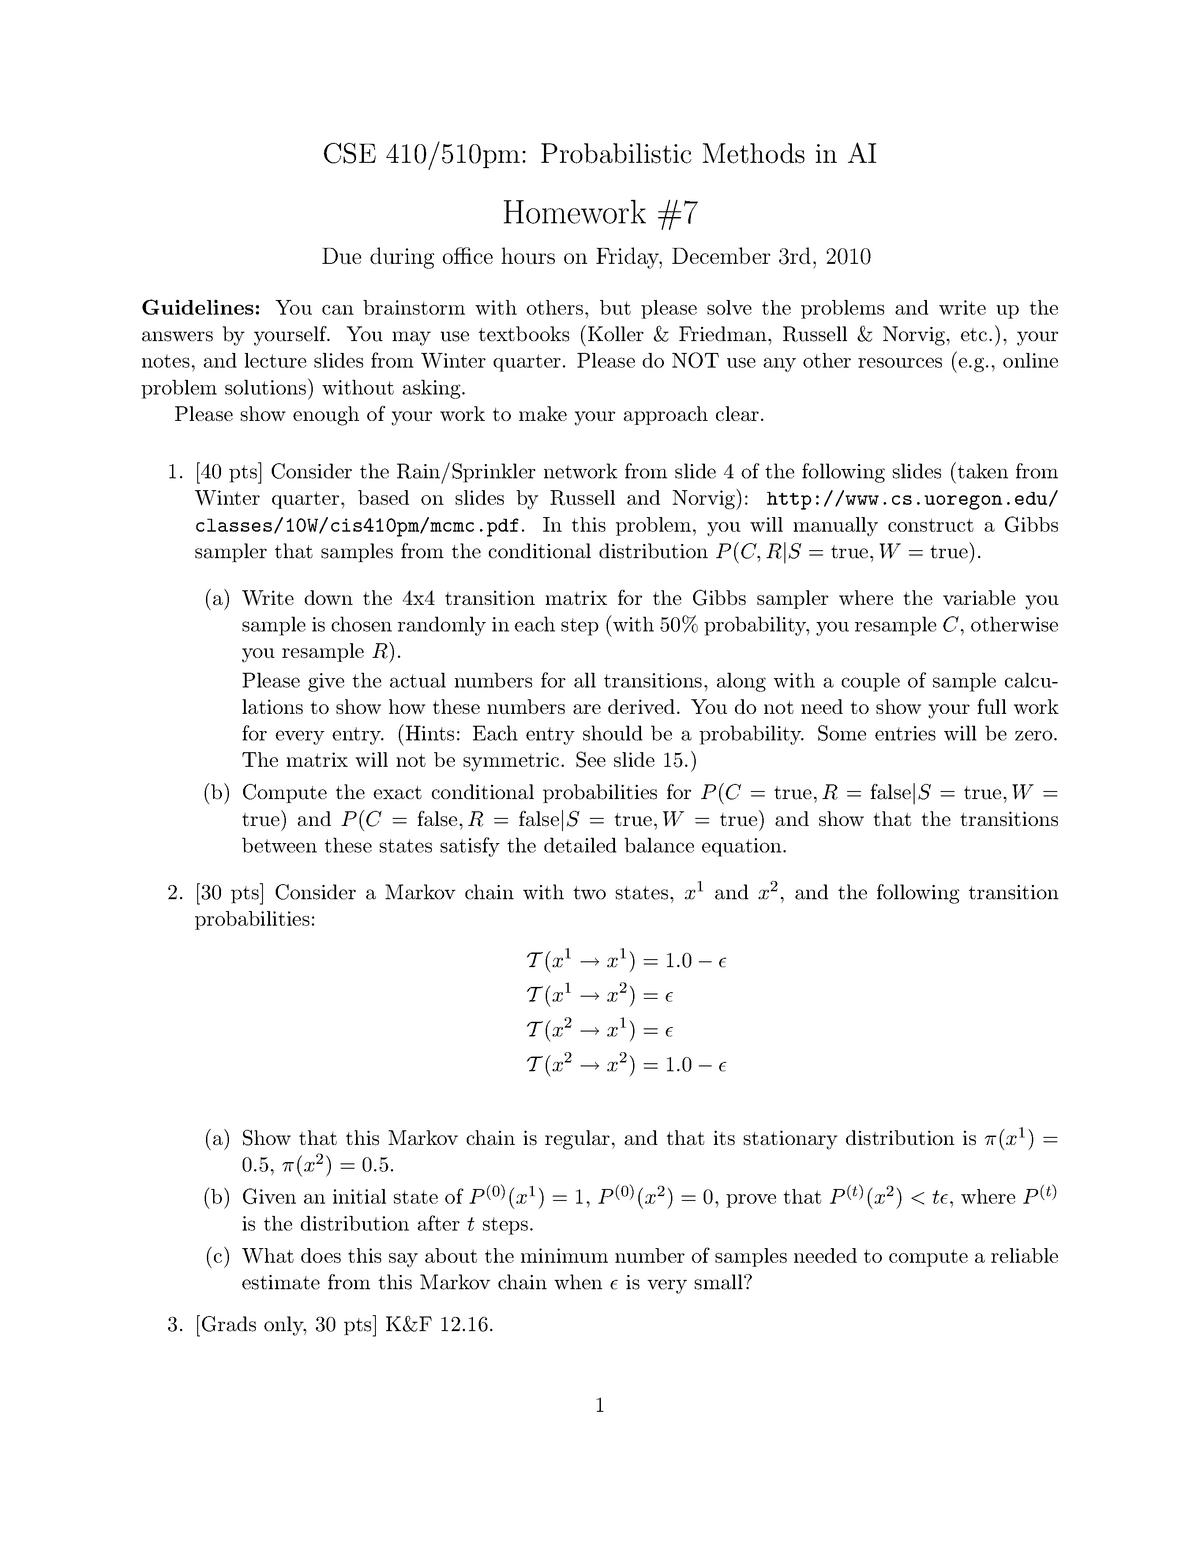 Hw7 - Homework assignment 7 - CIS 410: Probabilistic Methods